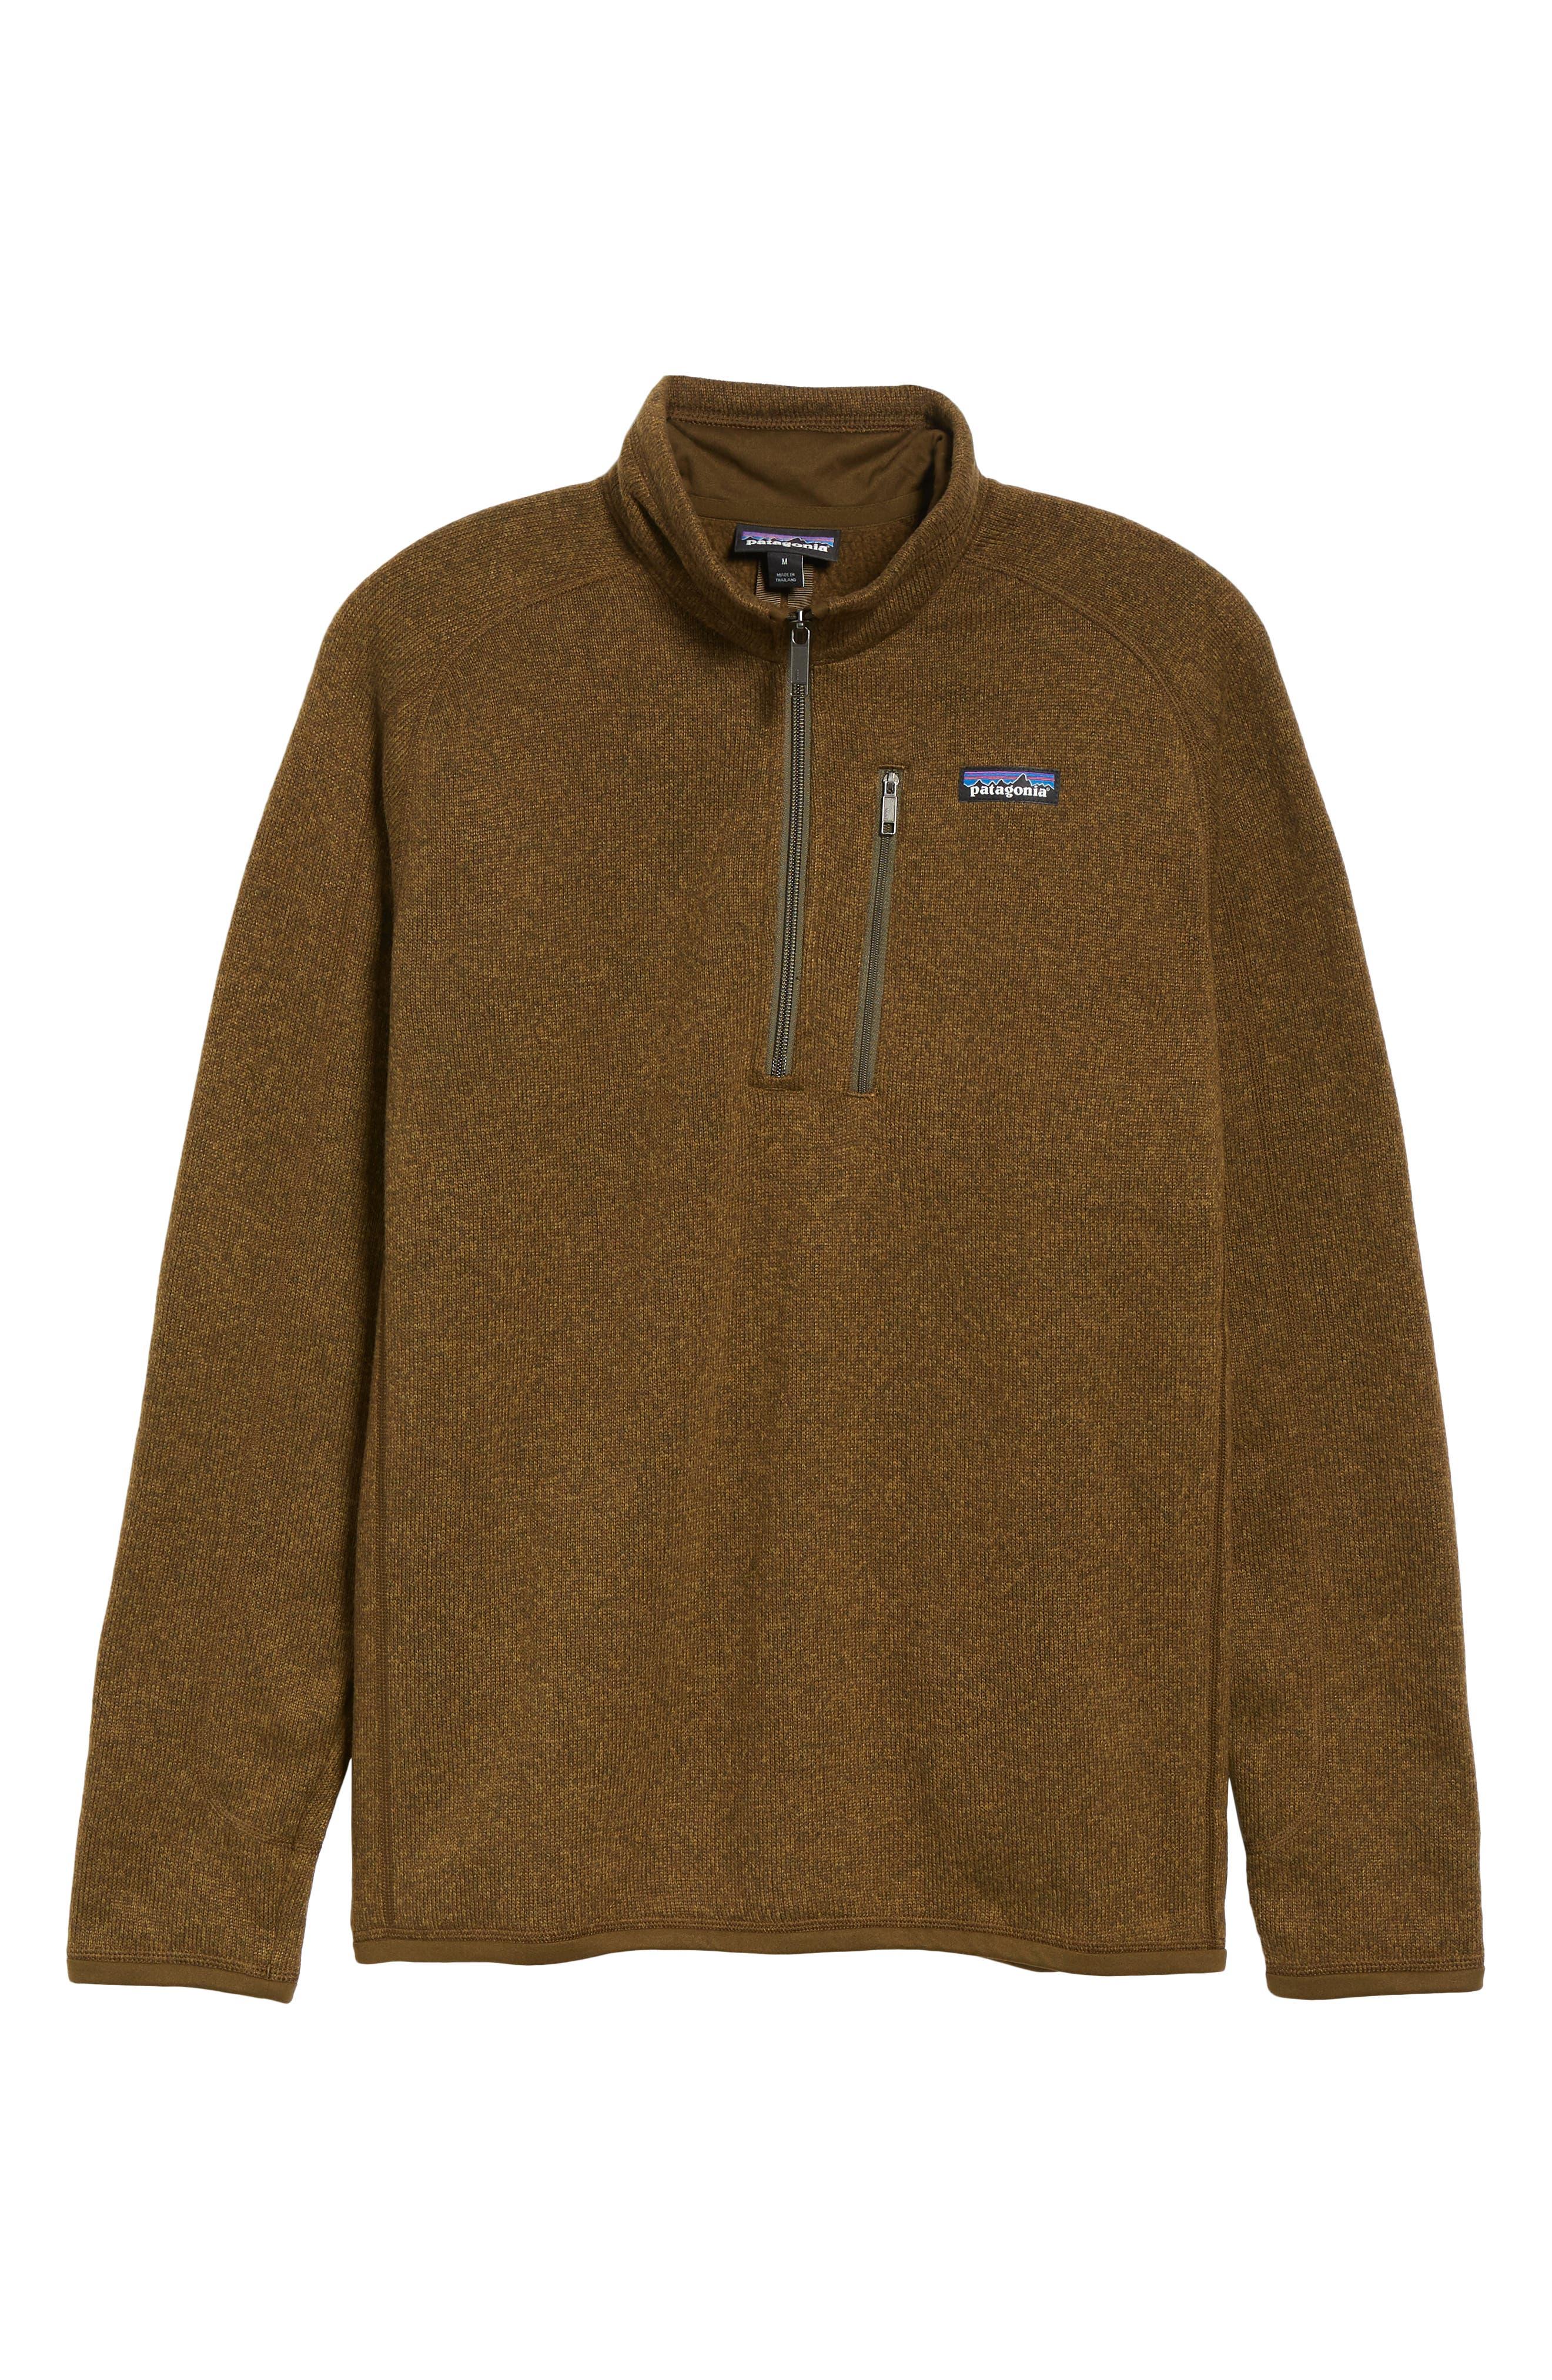 'Better Sweater' Quarter Zip Pullover,                             Alternate thumbnail 6, color,                             SEDIMENT